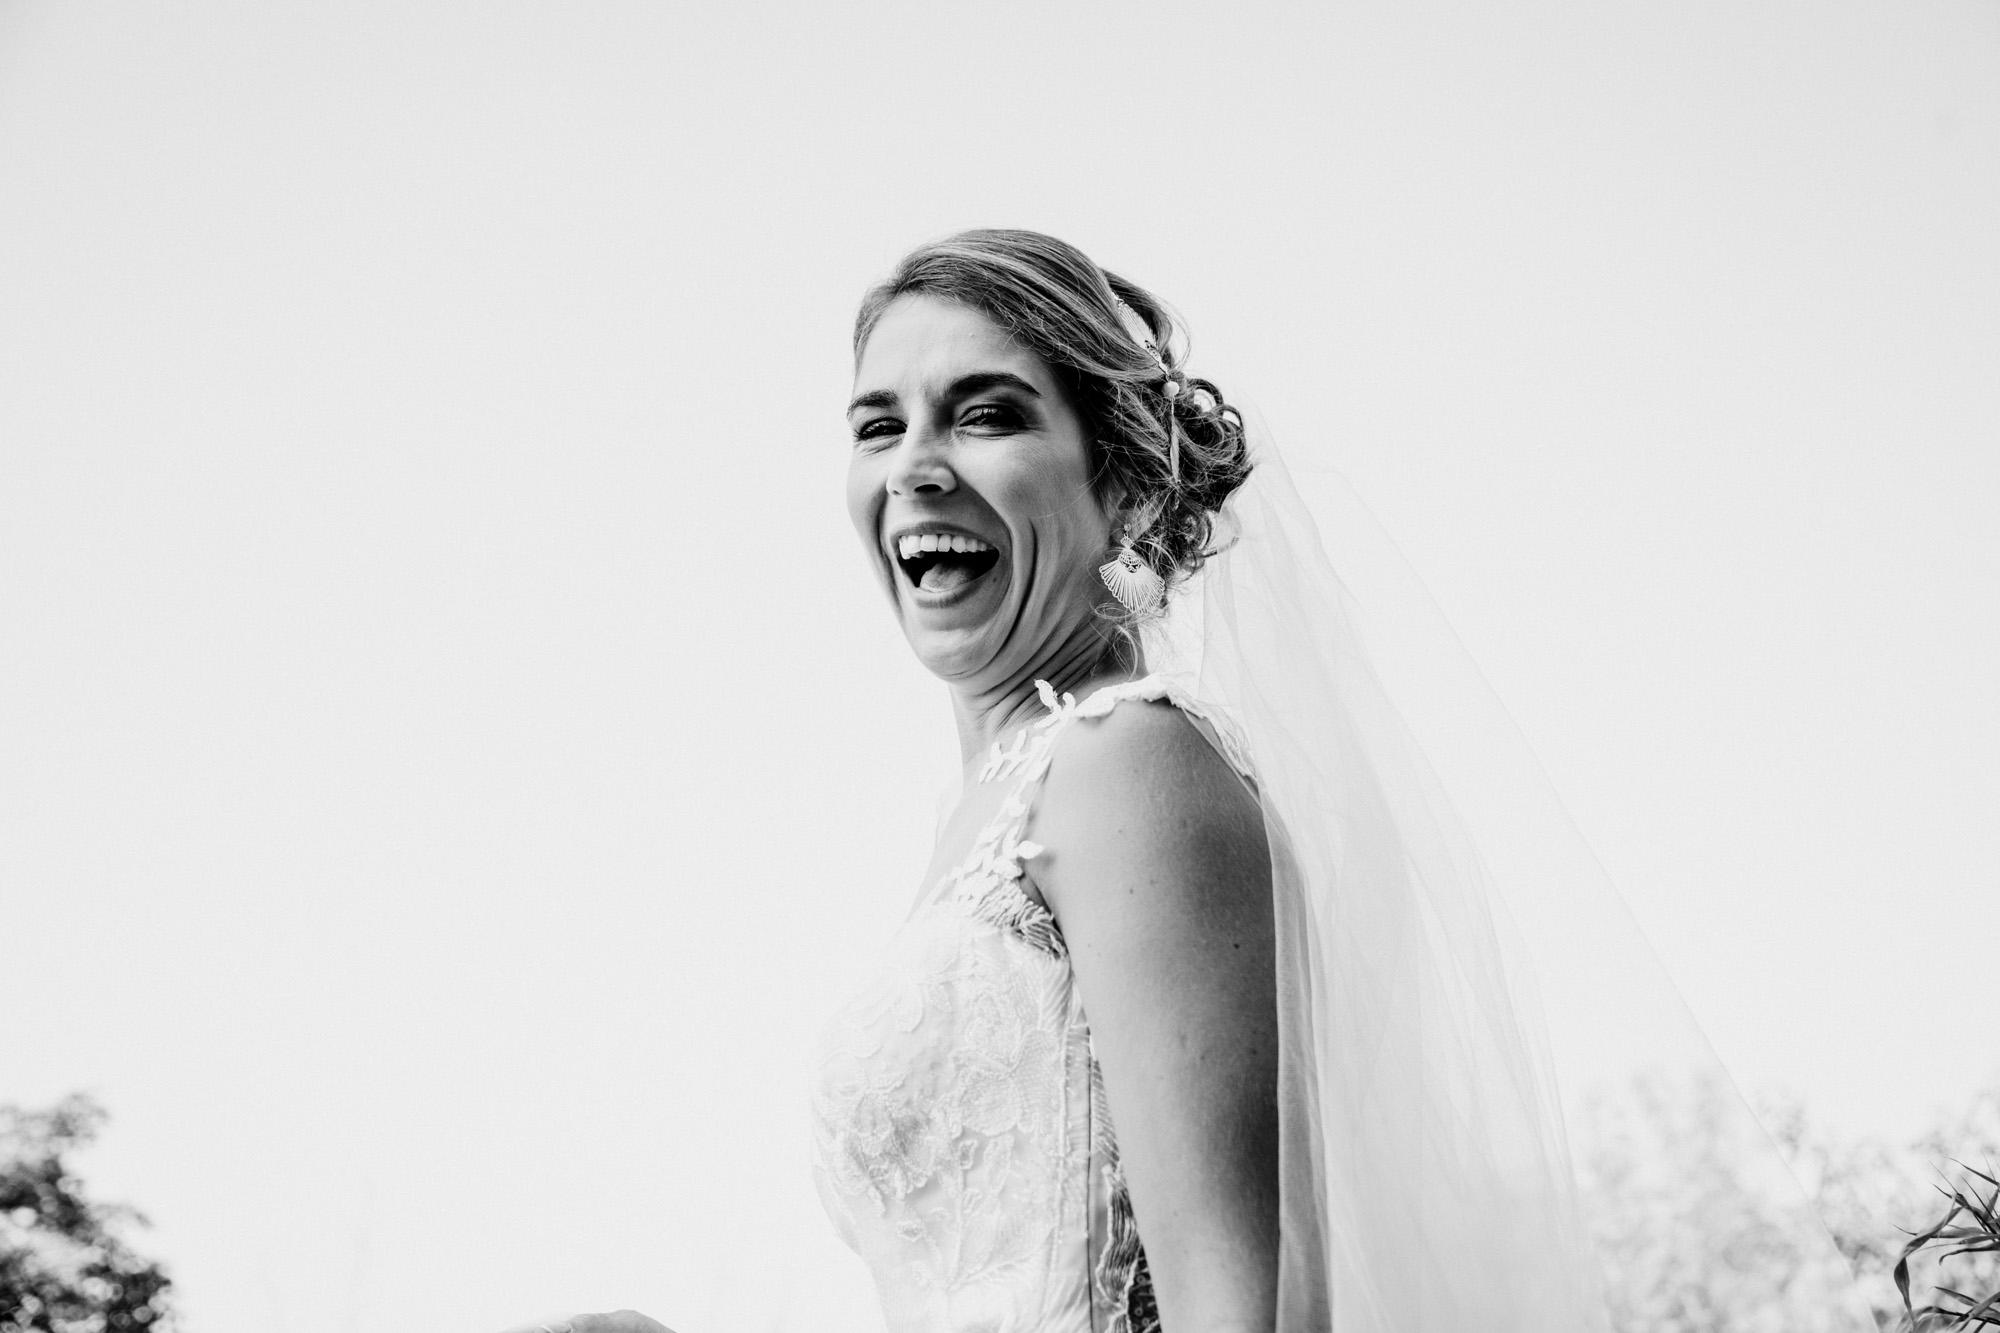 2018-09-29 - LD8_0691 - photographe mariage lyon - laurie diaz - www.lauriediazweeding.com.jpg